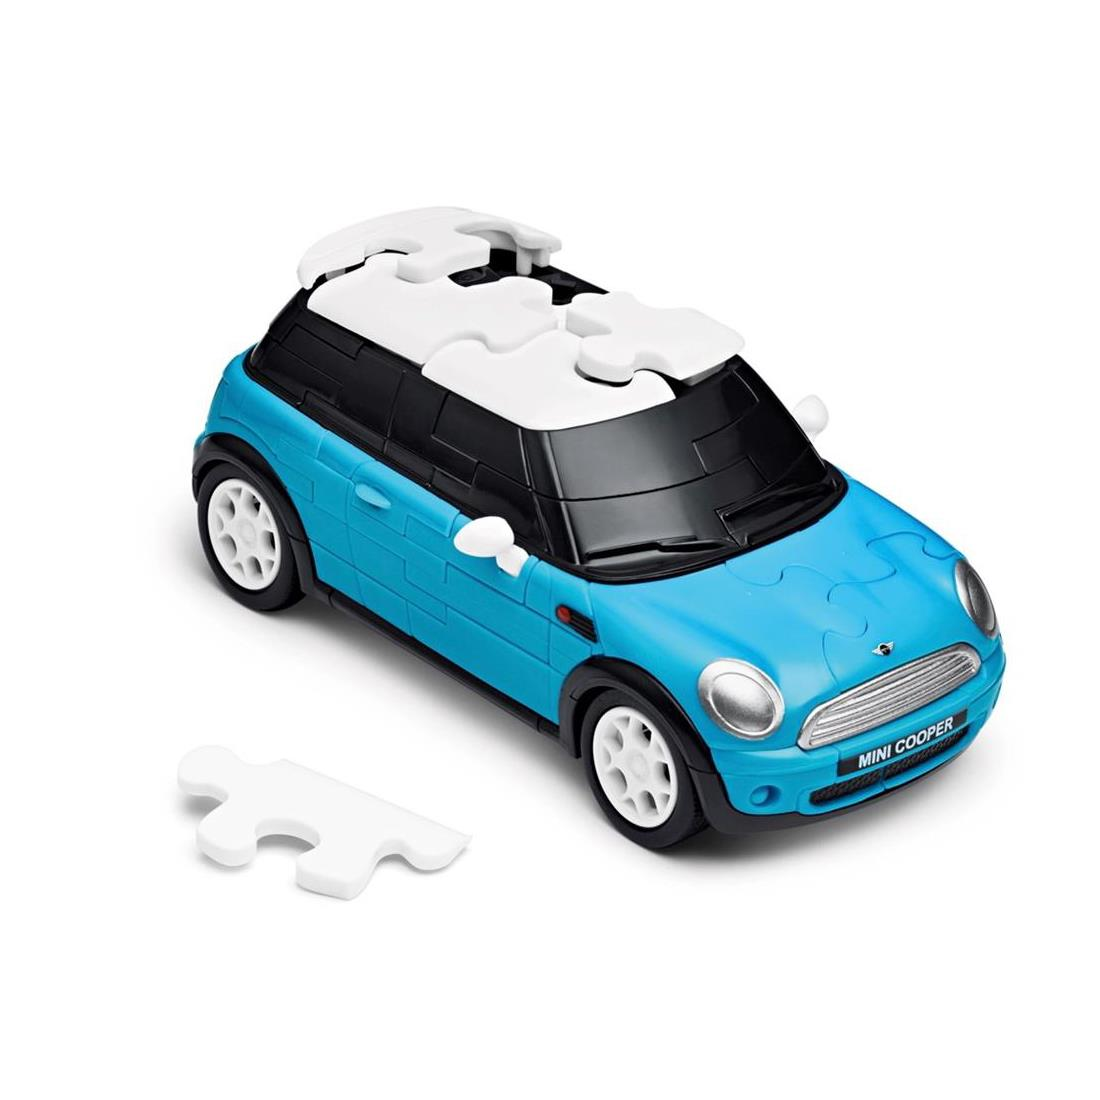 mini cooper s hardtop puzzle car. Black Bedroom Furniture Sets. Home Design Ideas